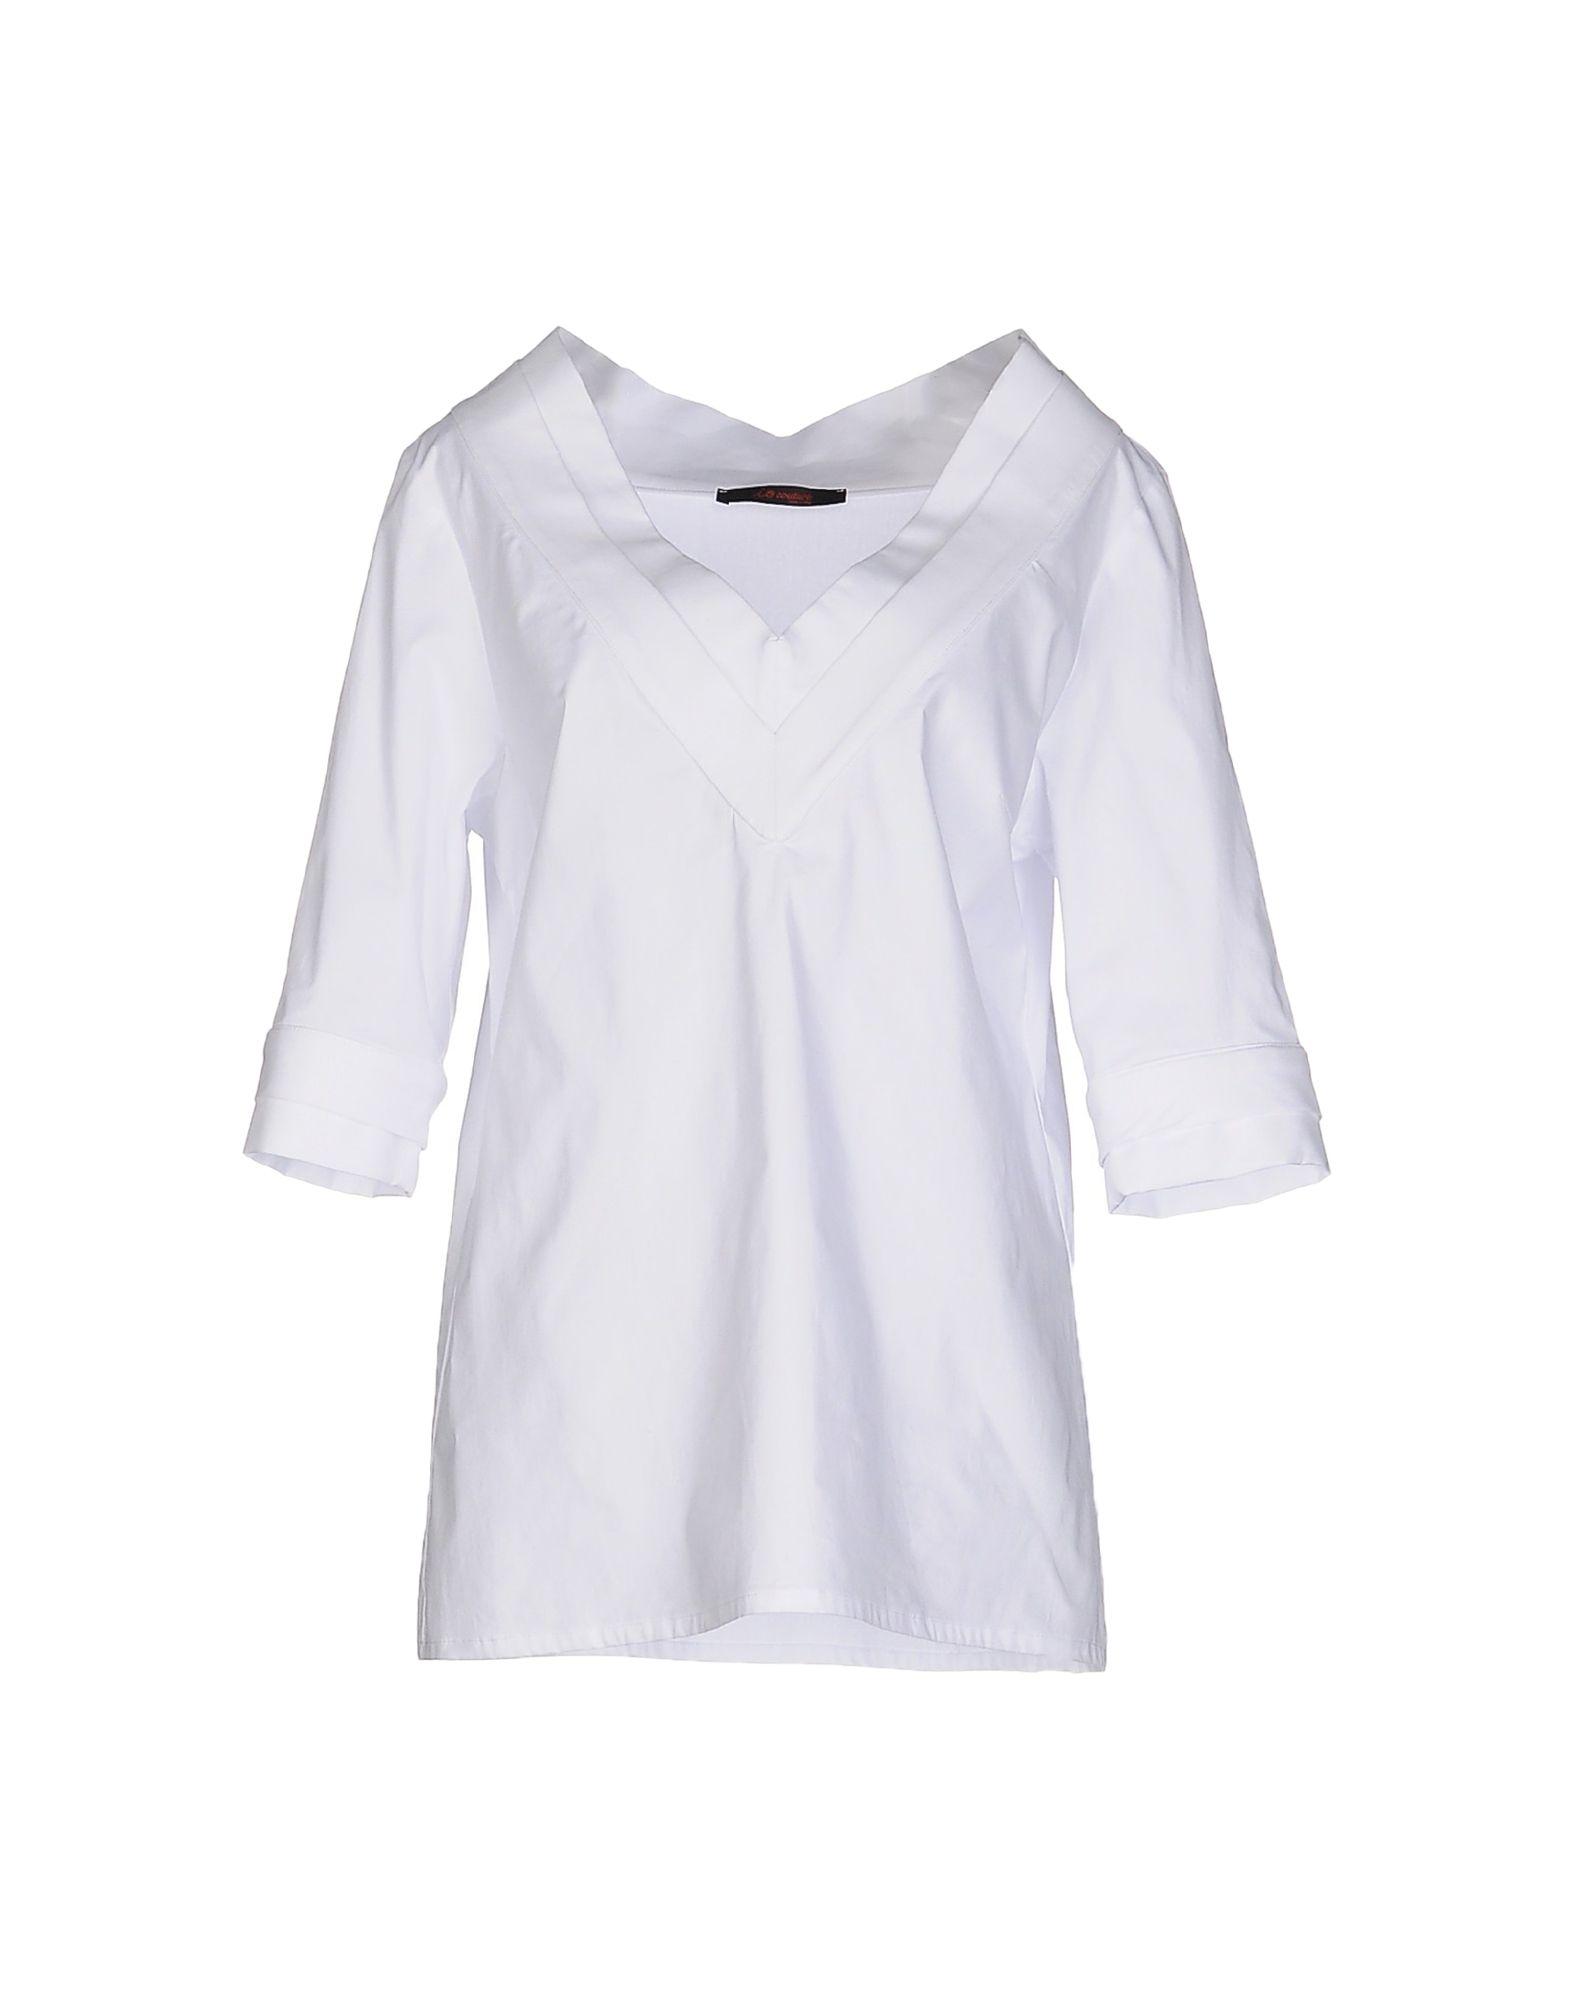 IO COUTURE Блузка io ivana omazić блузка